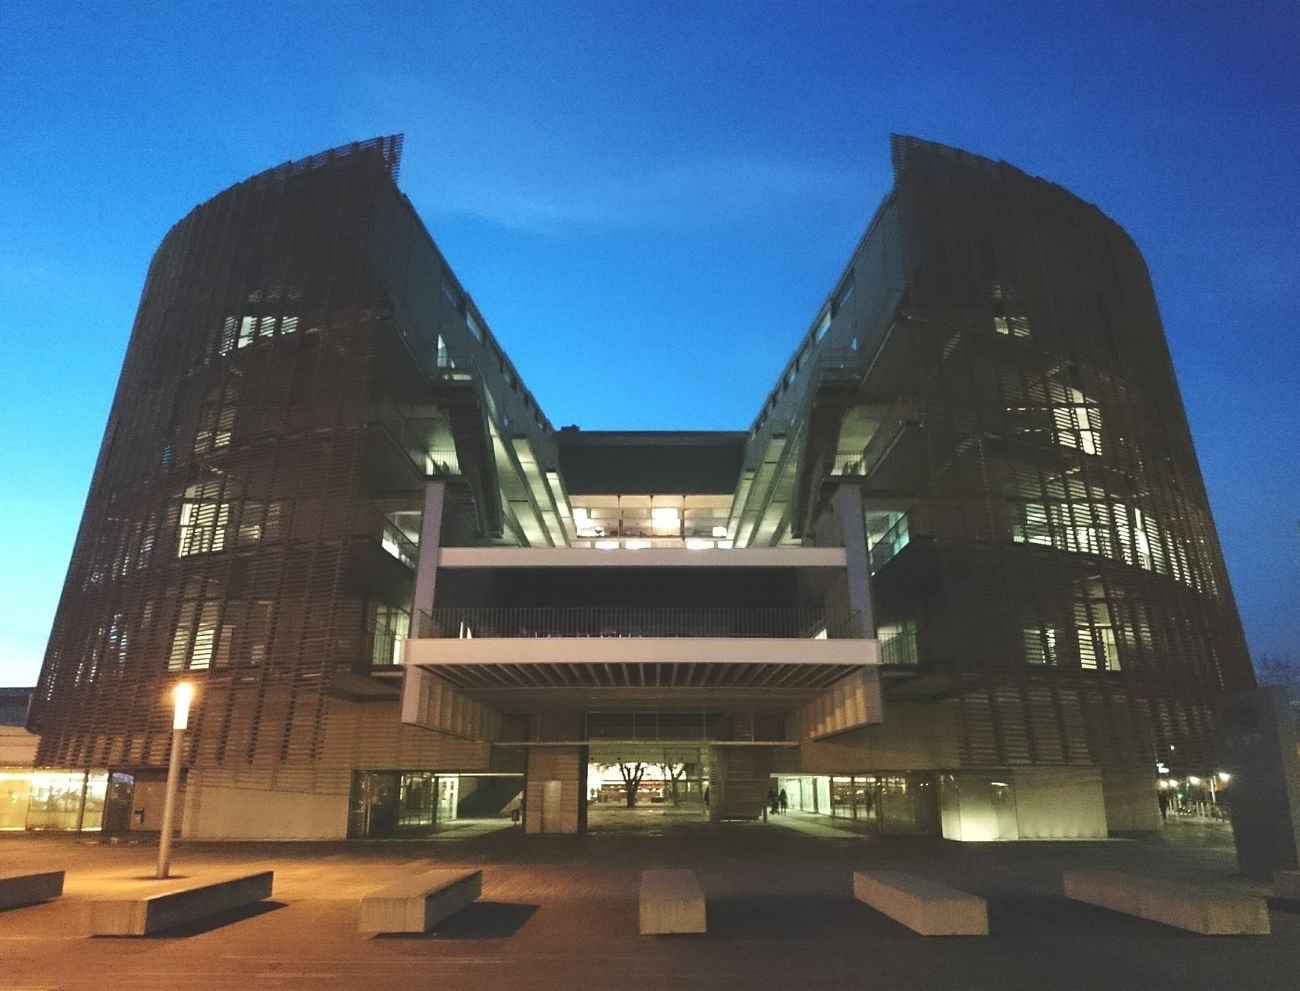 Architecture Arkiromantix Night Shot Archilovers XPERIA